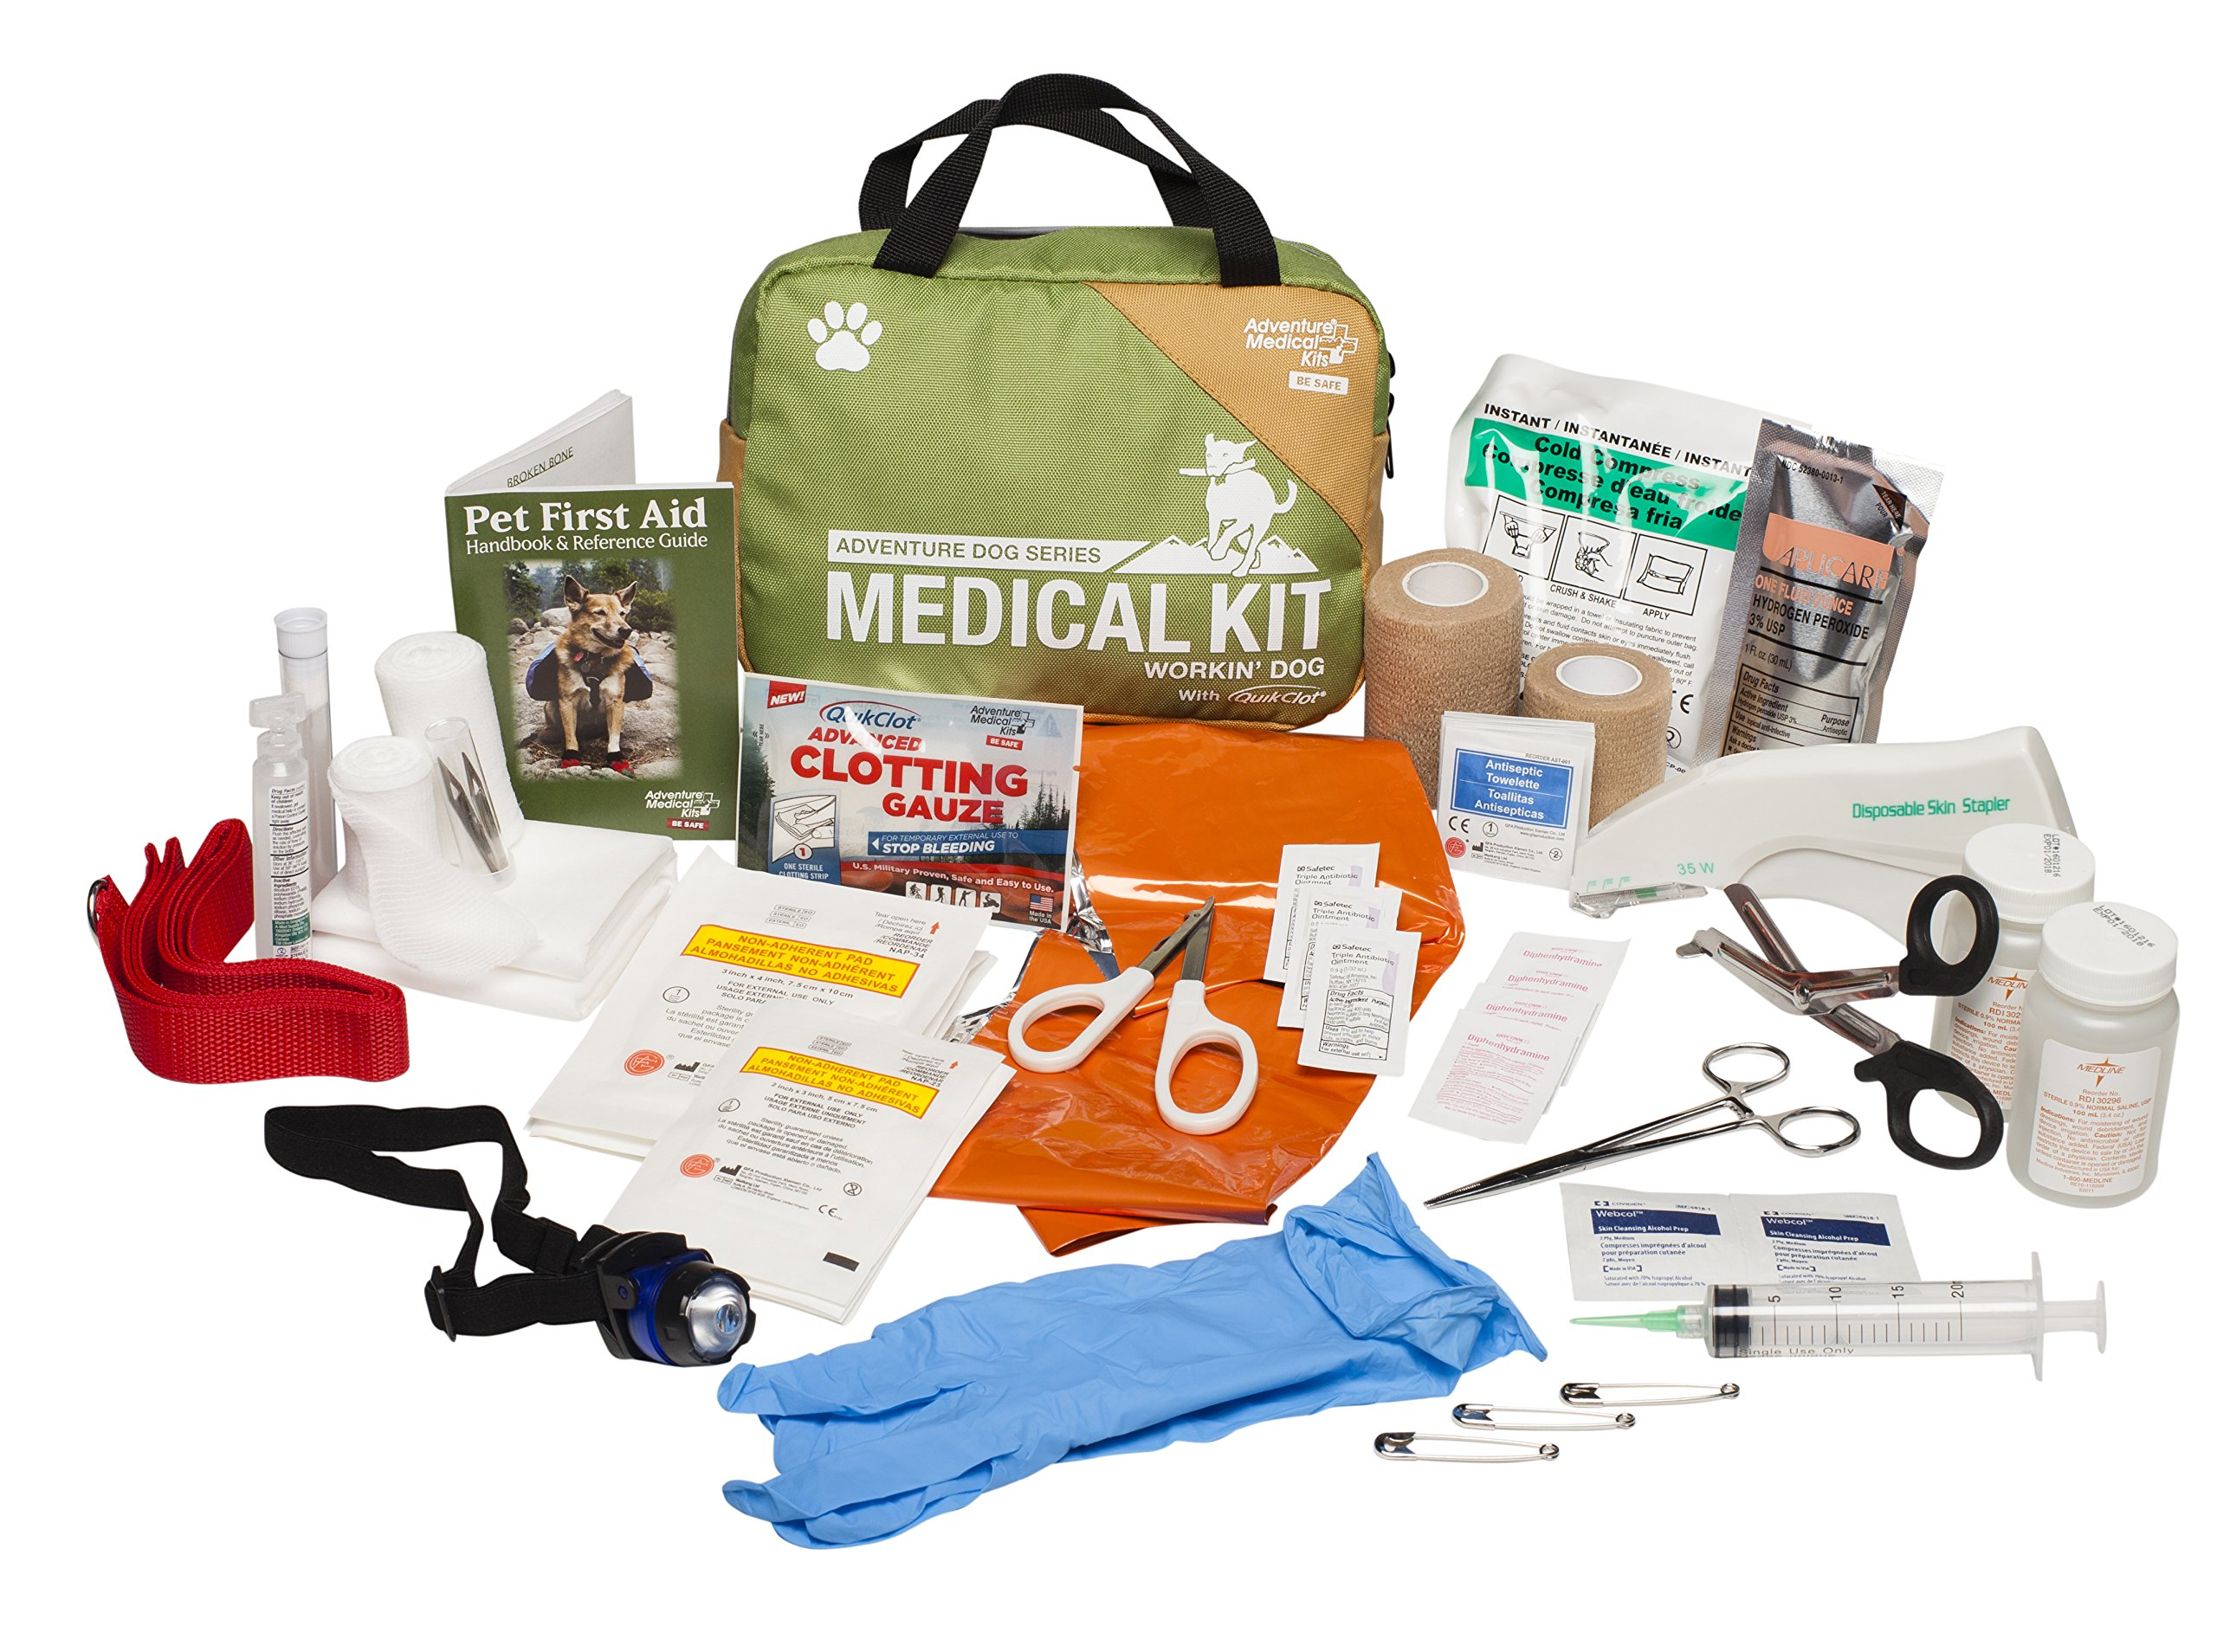 Adventure Medical Kits Adventure Dog Series Workin' Dog First Aid Kit by Adventure Medical Kits